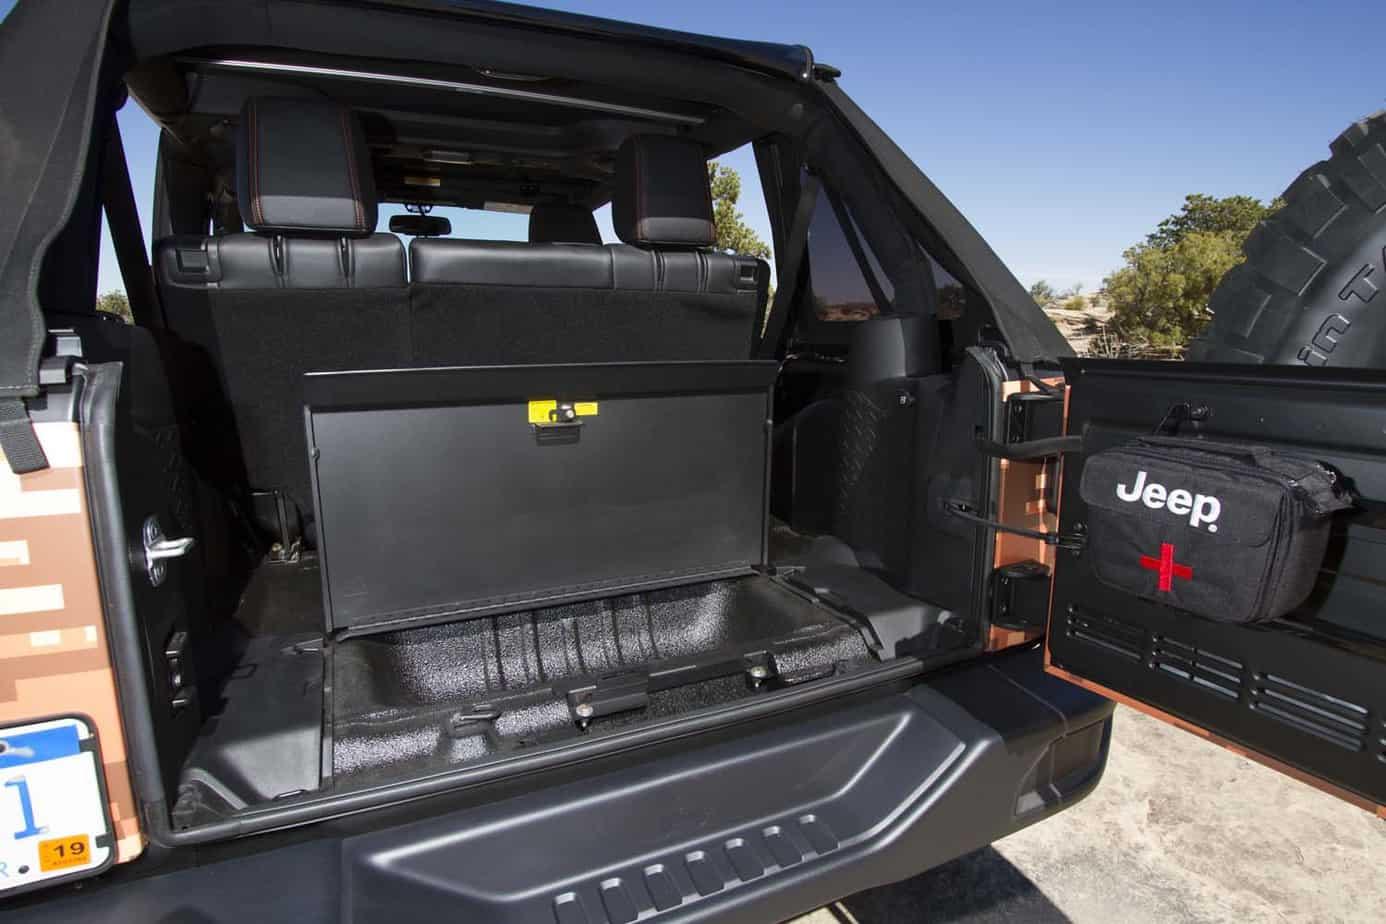 Jeep Trailstorm 029